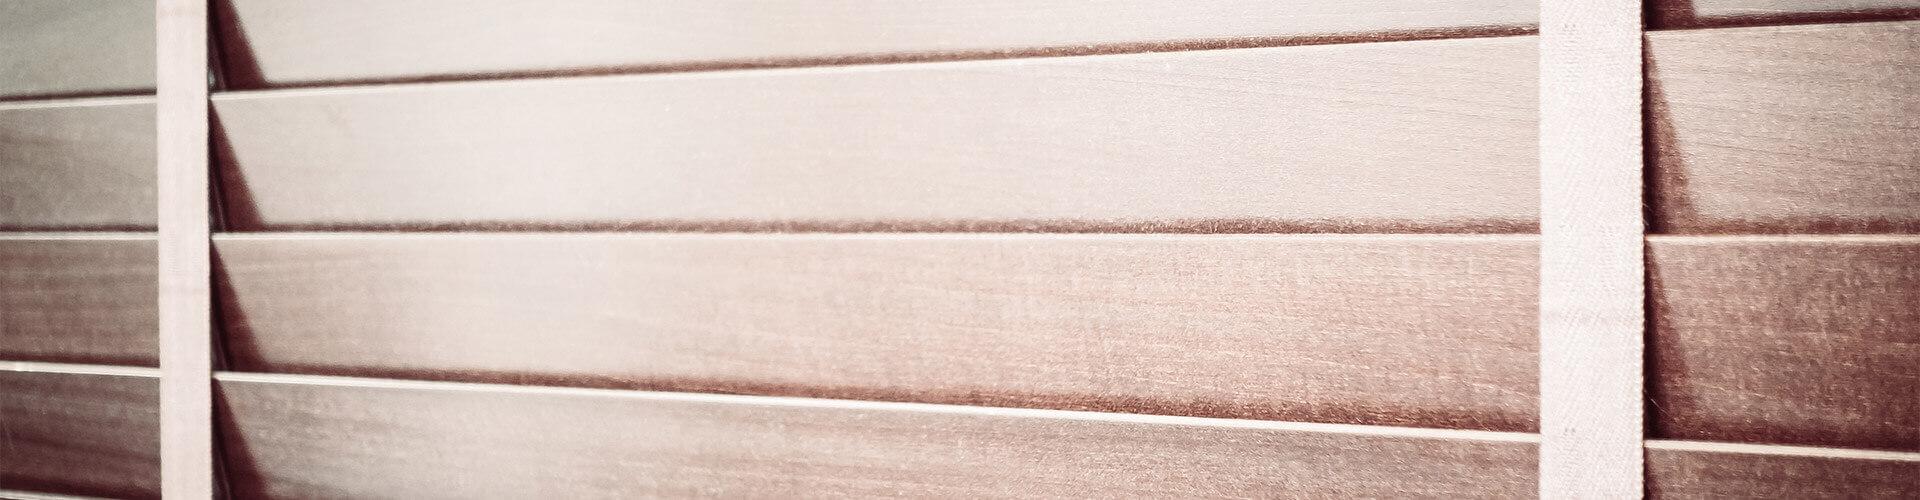 Carpinter a de aluminio en madrid persianista y for Carpinteria de aluminio en madrid